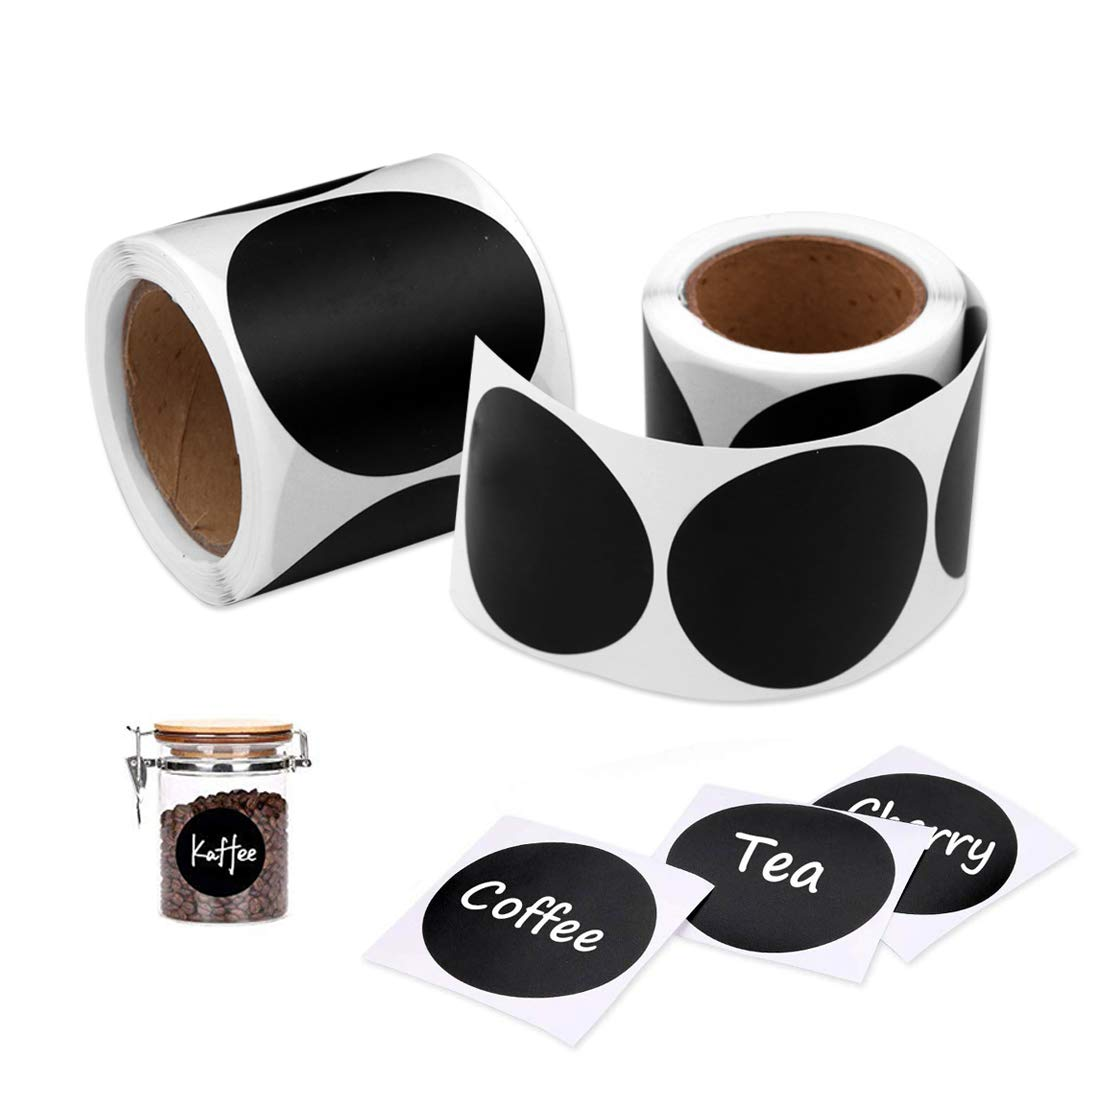 etiquetas de cocina Etiquetas de puntos de codificaci/ón de color negro redondo de 5 cm para frascos Etiquetas Adhesivas 240 piezas Etiquetas de Pizarra Pegatinas botellas contenedores